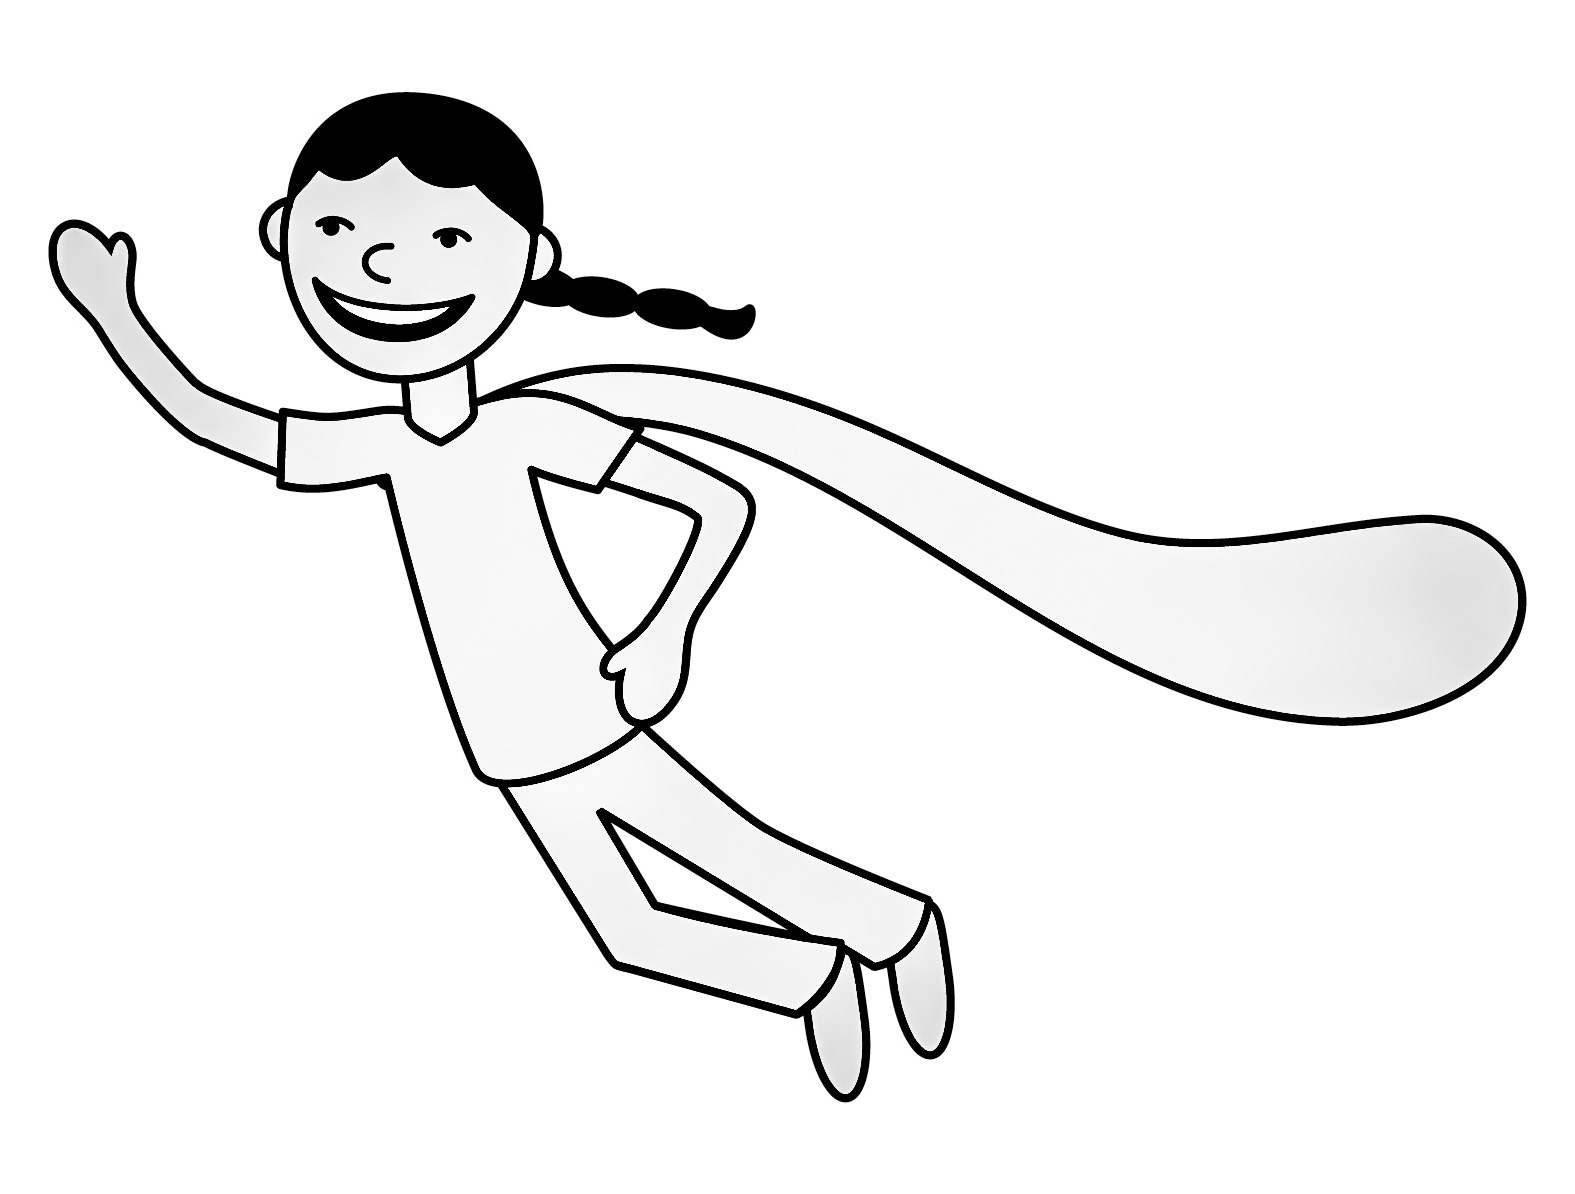 hope kids, cape kids, super hero kids